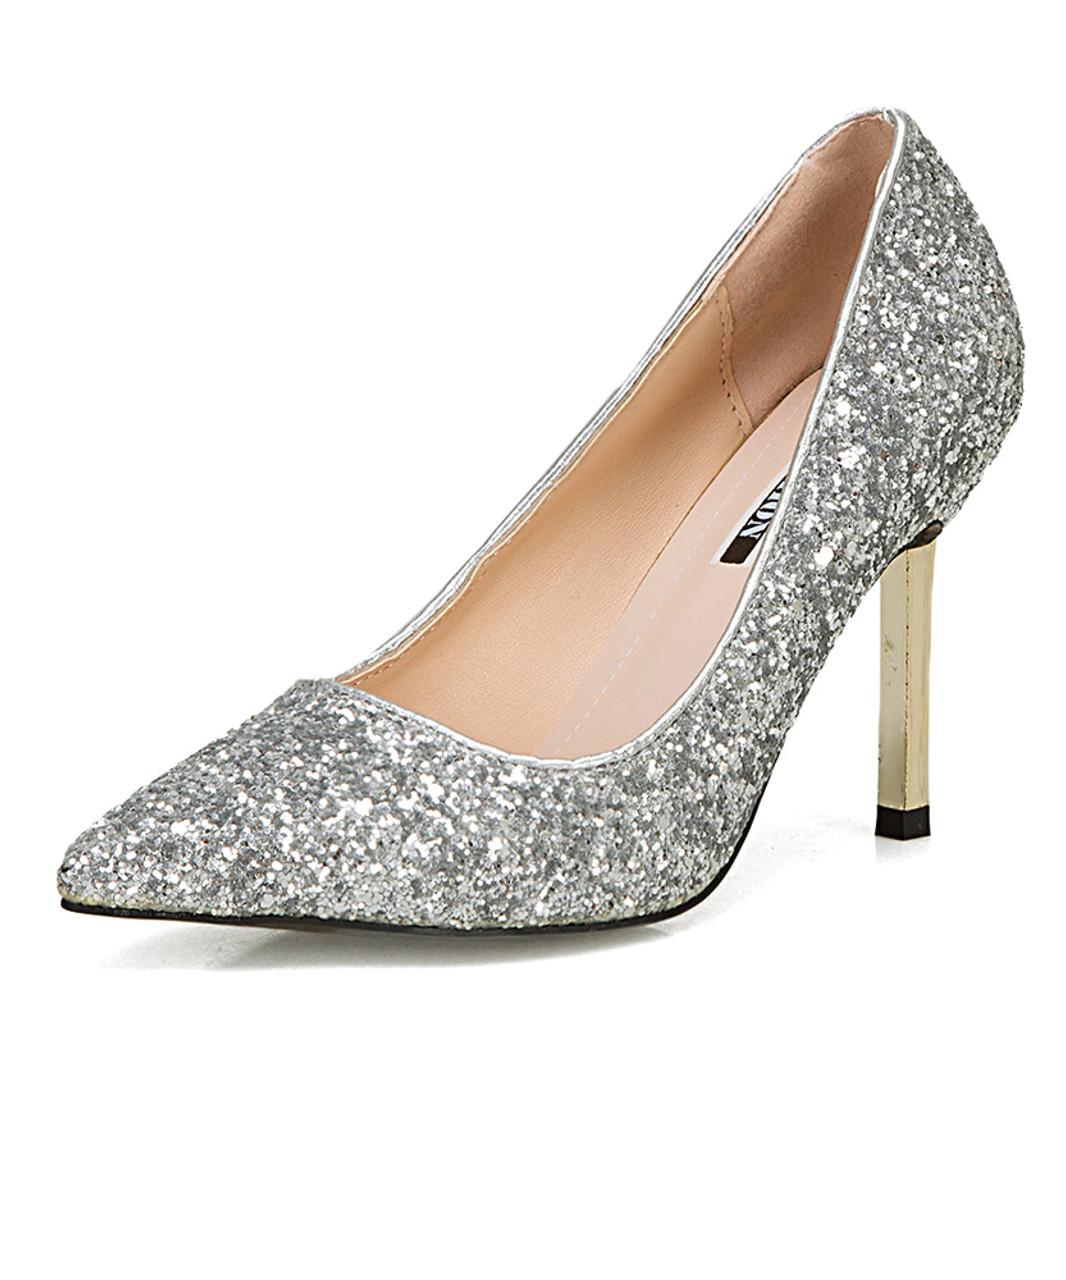 silver sequin dress shoes